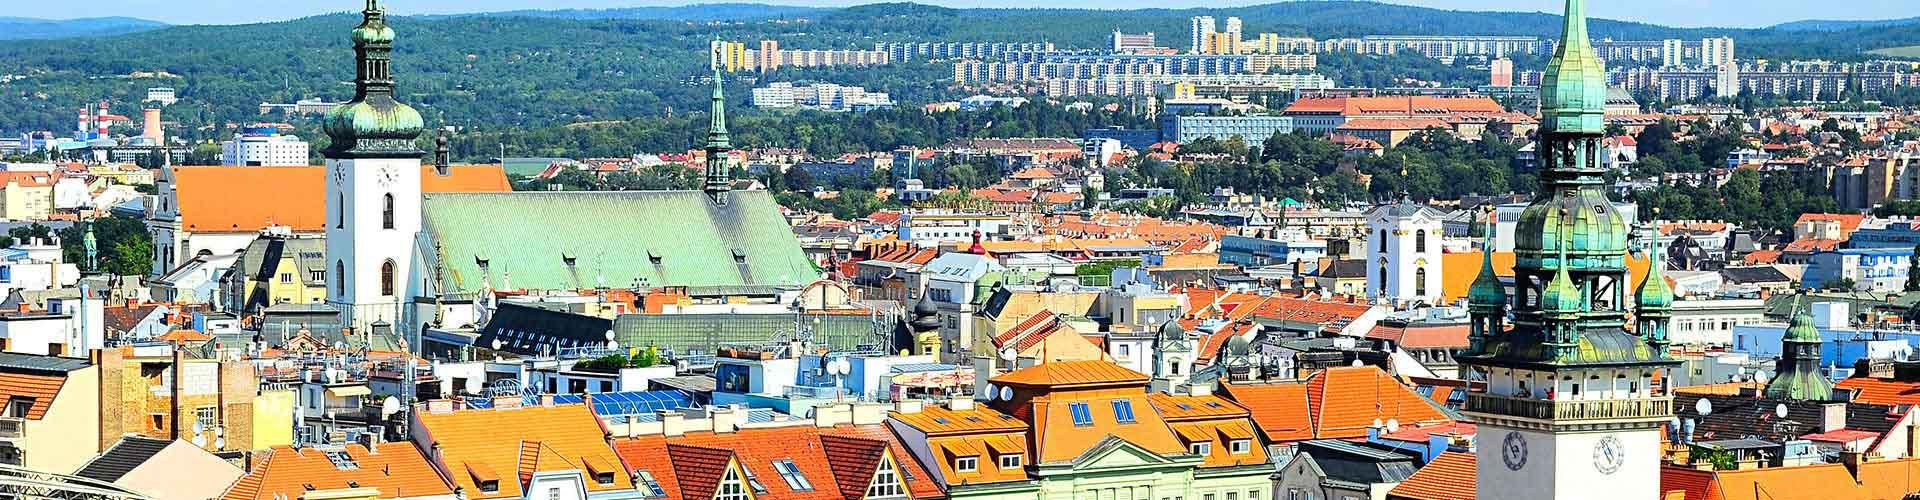 Brno - Auberges de jeunesse à Brno. Cartes pour Brno, photos et commentaires pour chaque auberge de jeunesse à Brno.